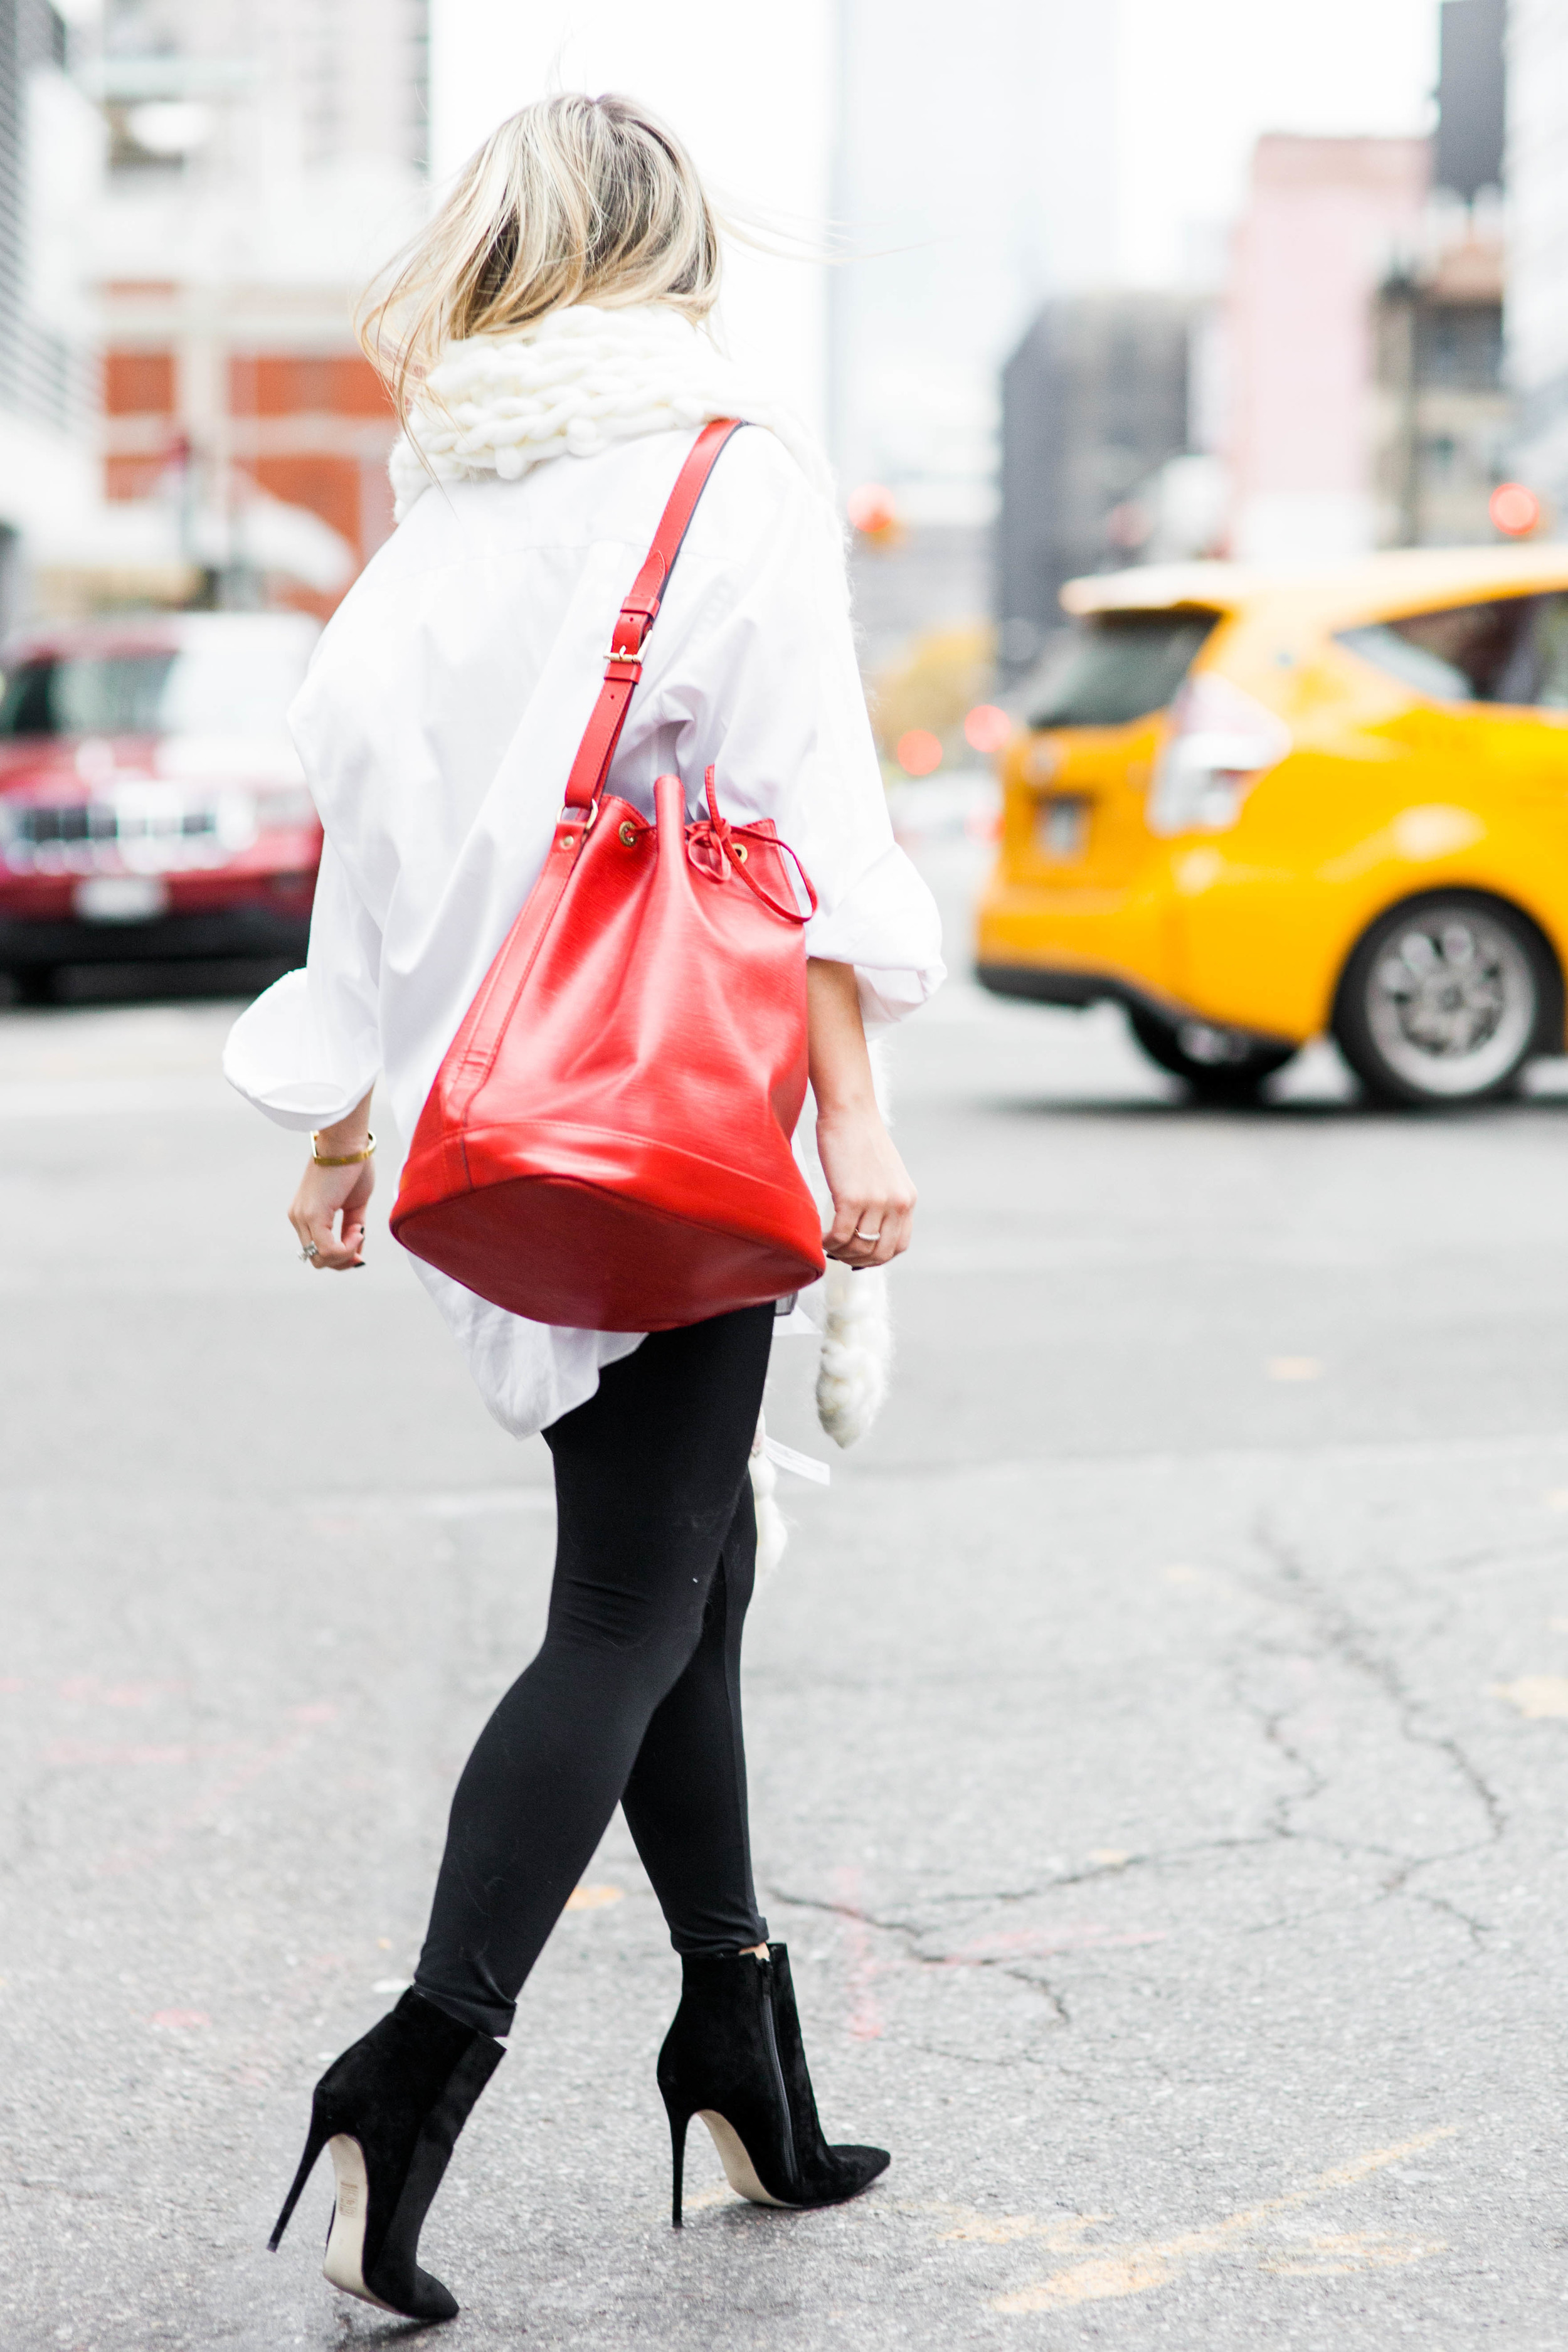 louisvuitton_redbag_trendlee